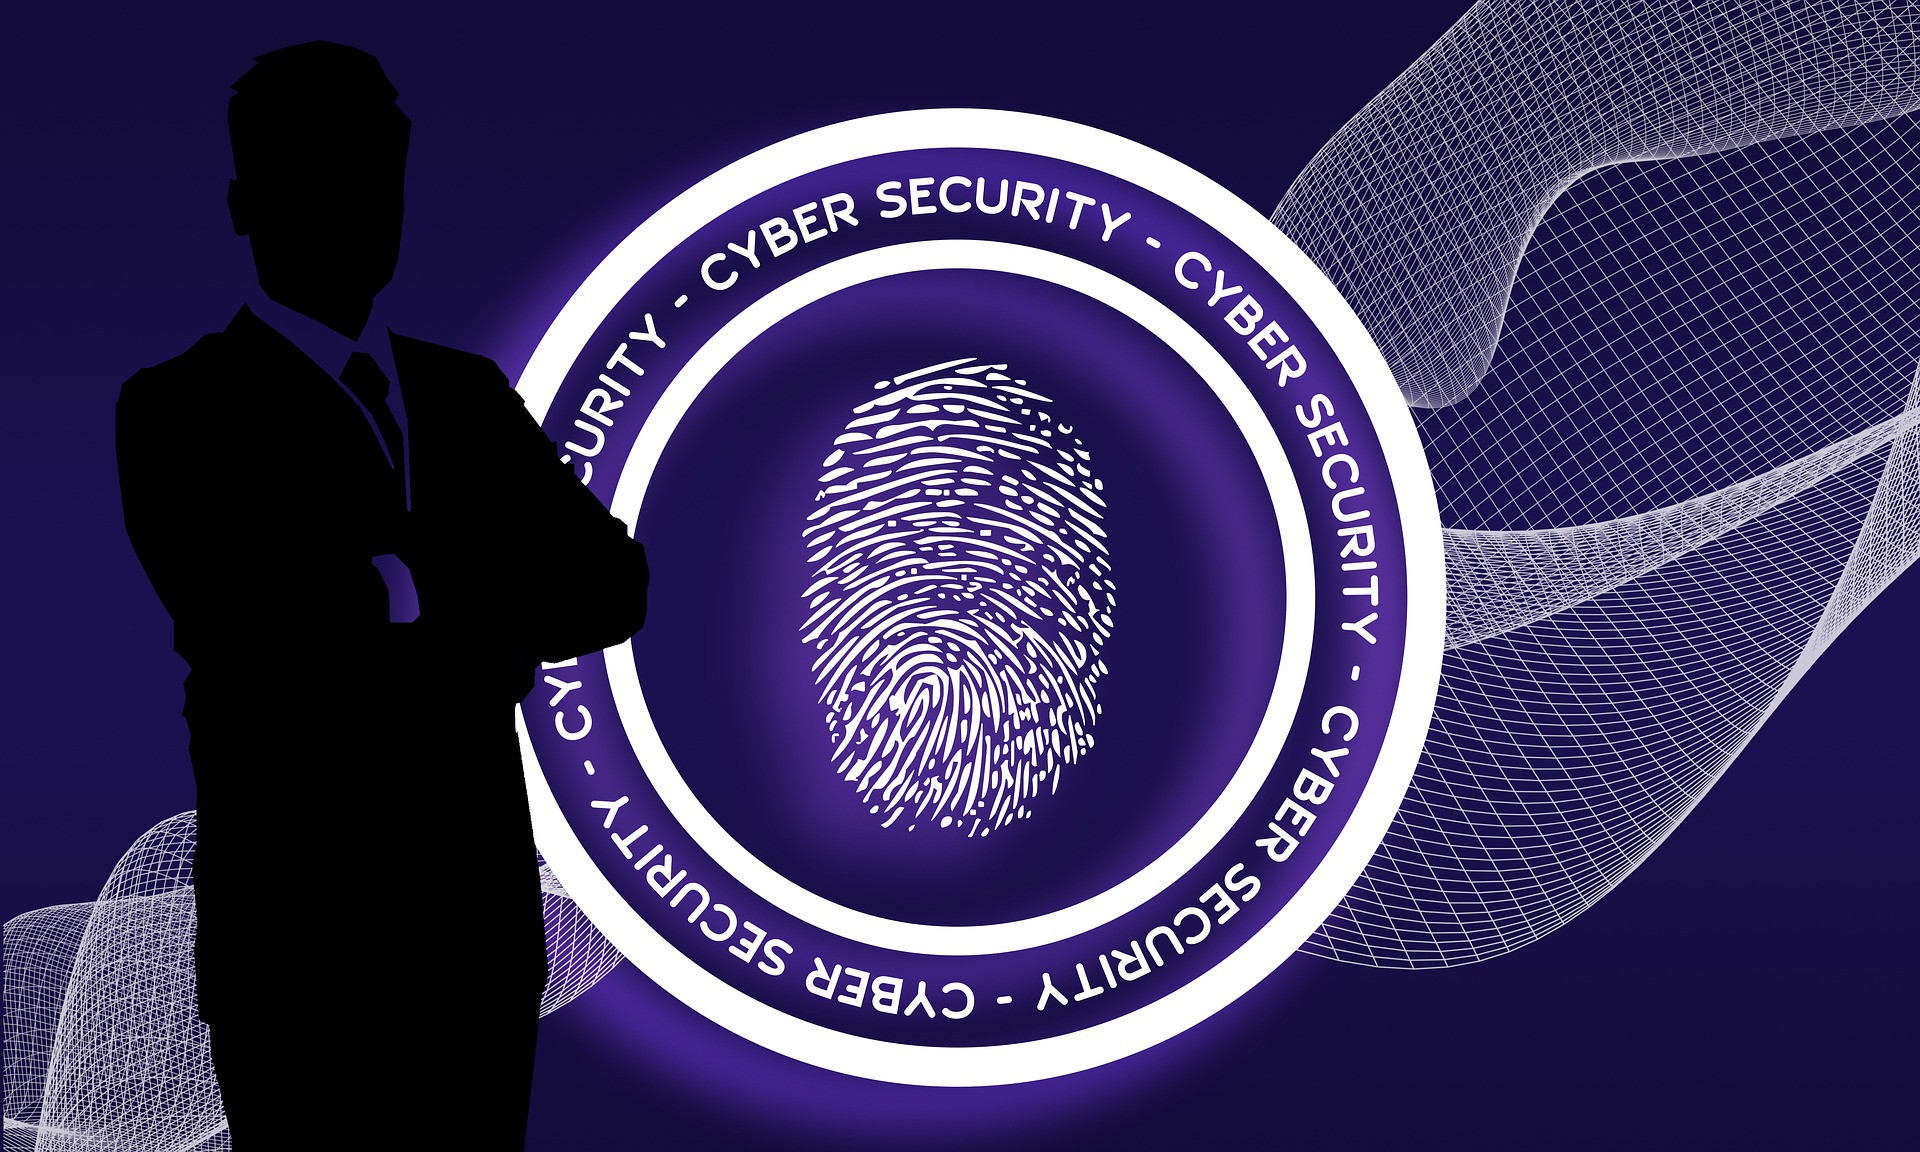 Basic Security Evaluation